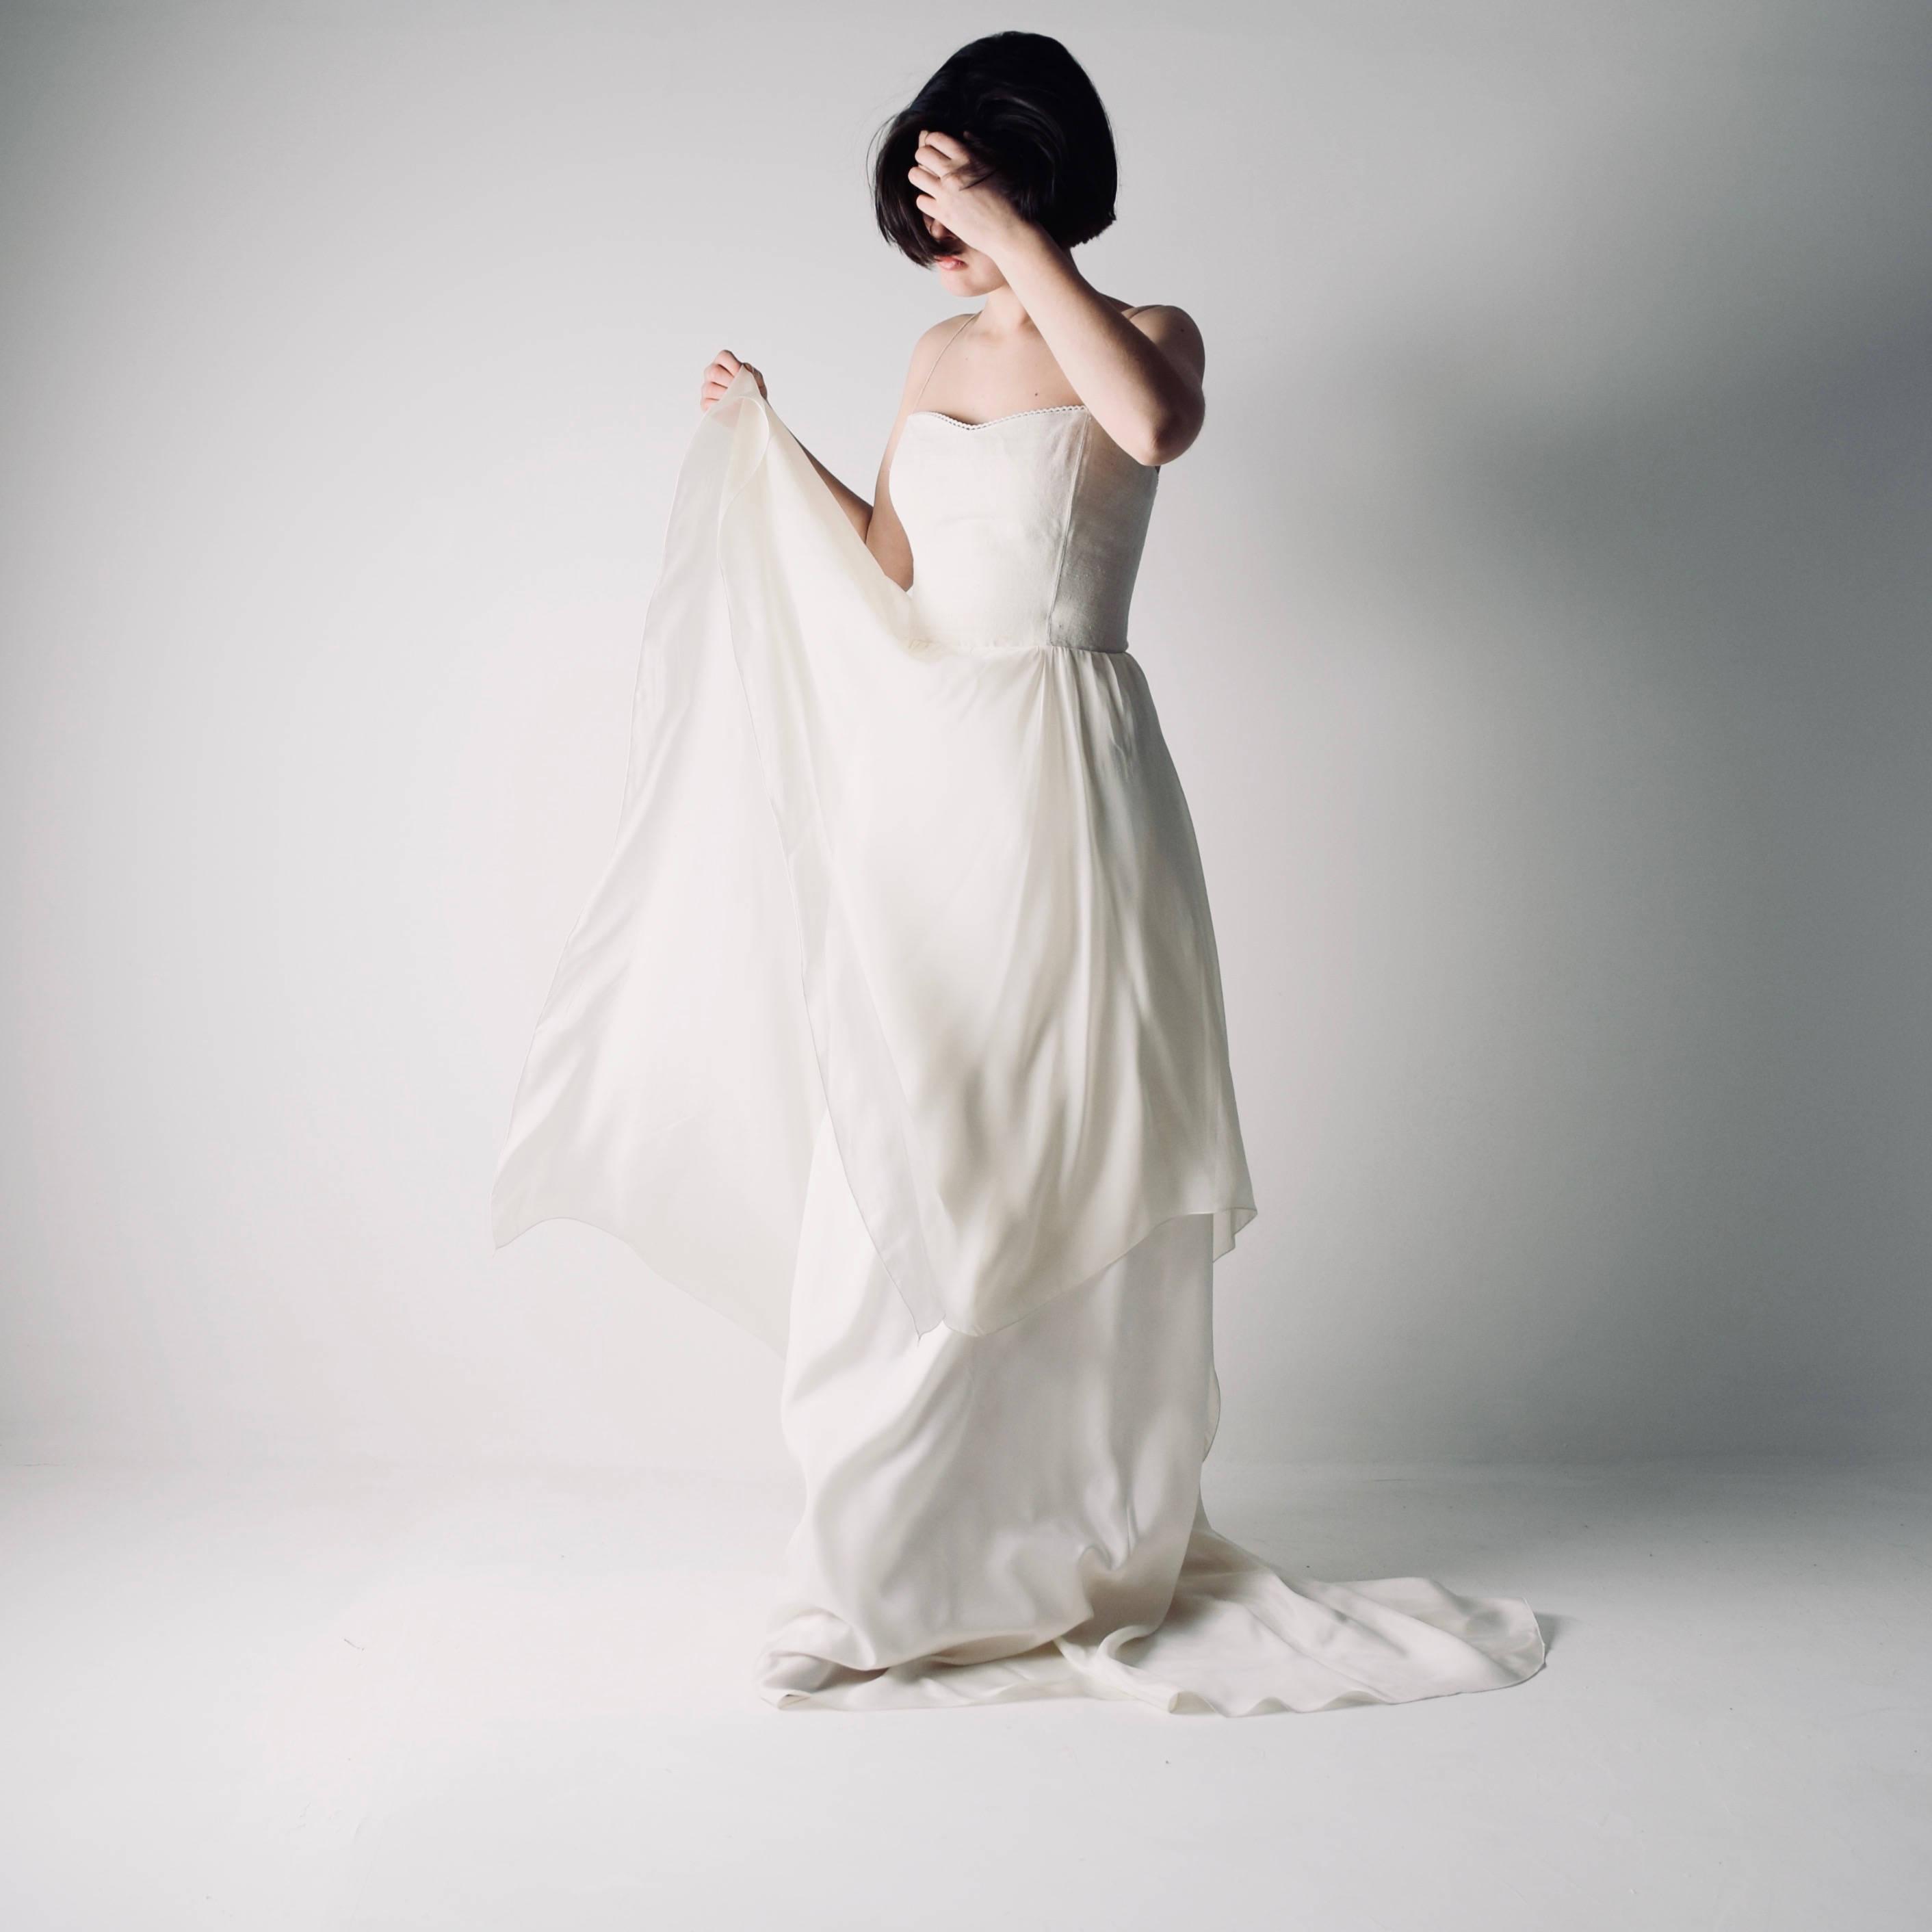 Corset Wedding Dresses.Agapanthus Hemp Corset Wedding Dress